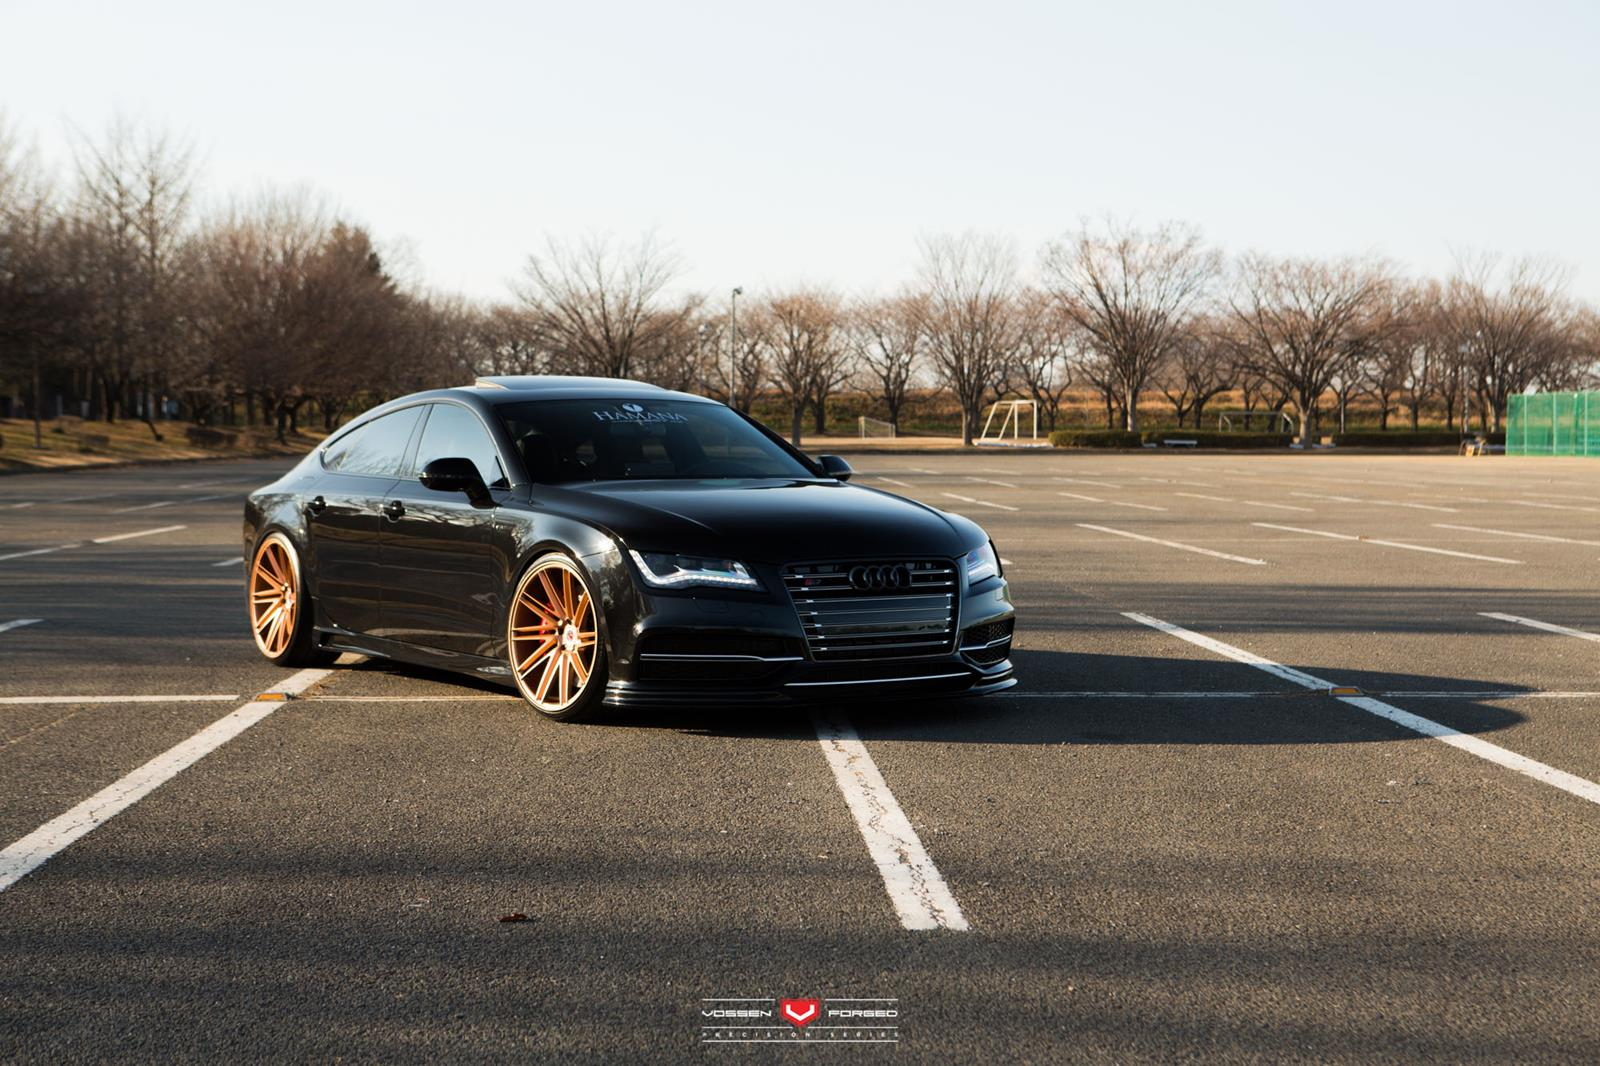 Black Audi Rs7 With Gold Vossen Wheels Gtspirit